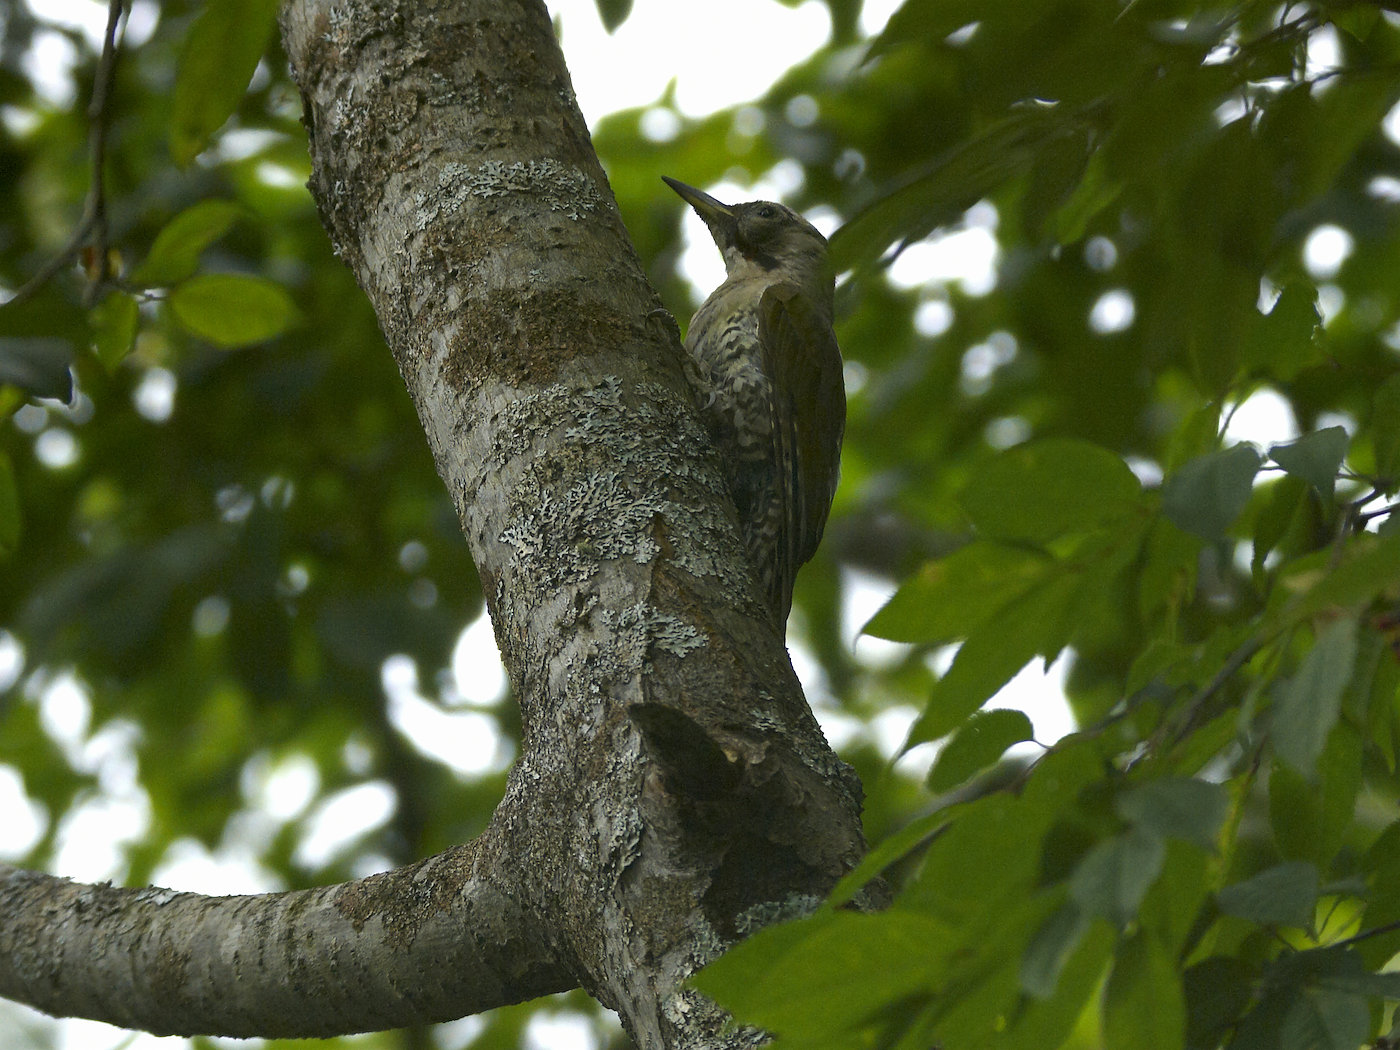 BORG71FLで撮影した野鳥・アオゲラの写真画像